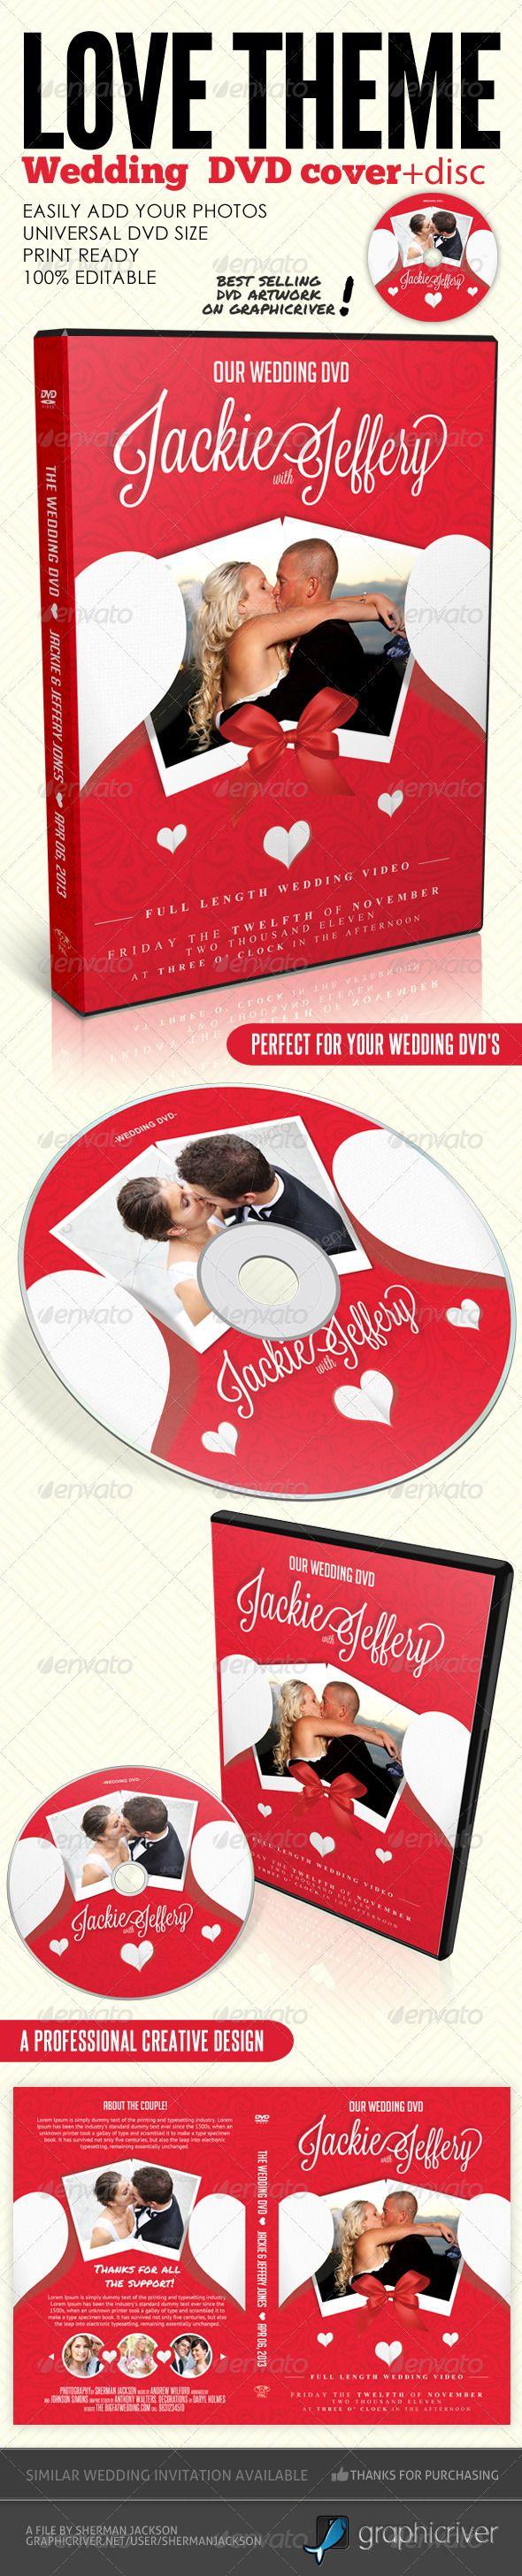 122 best cd dvd images on pinterest cd cover template print